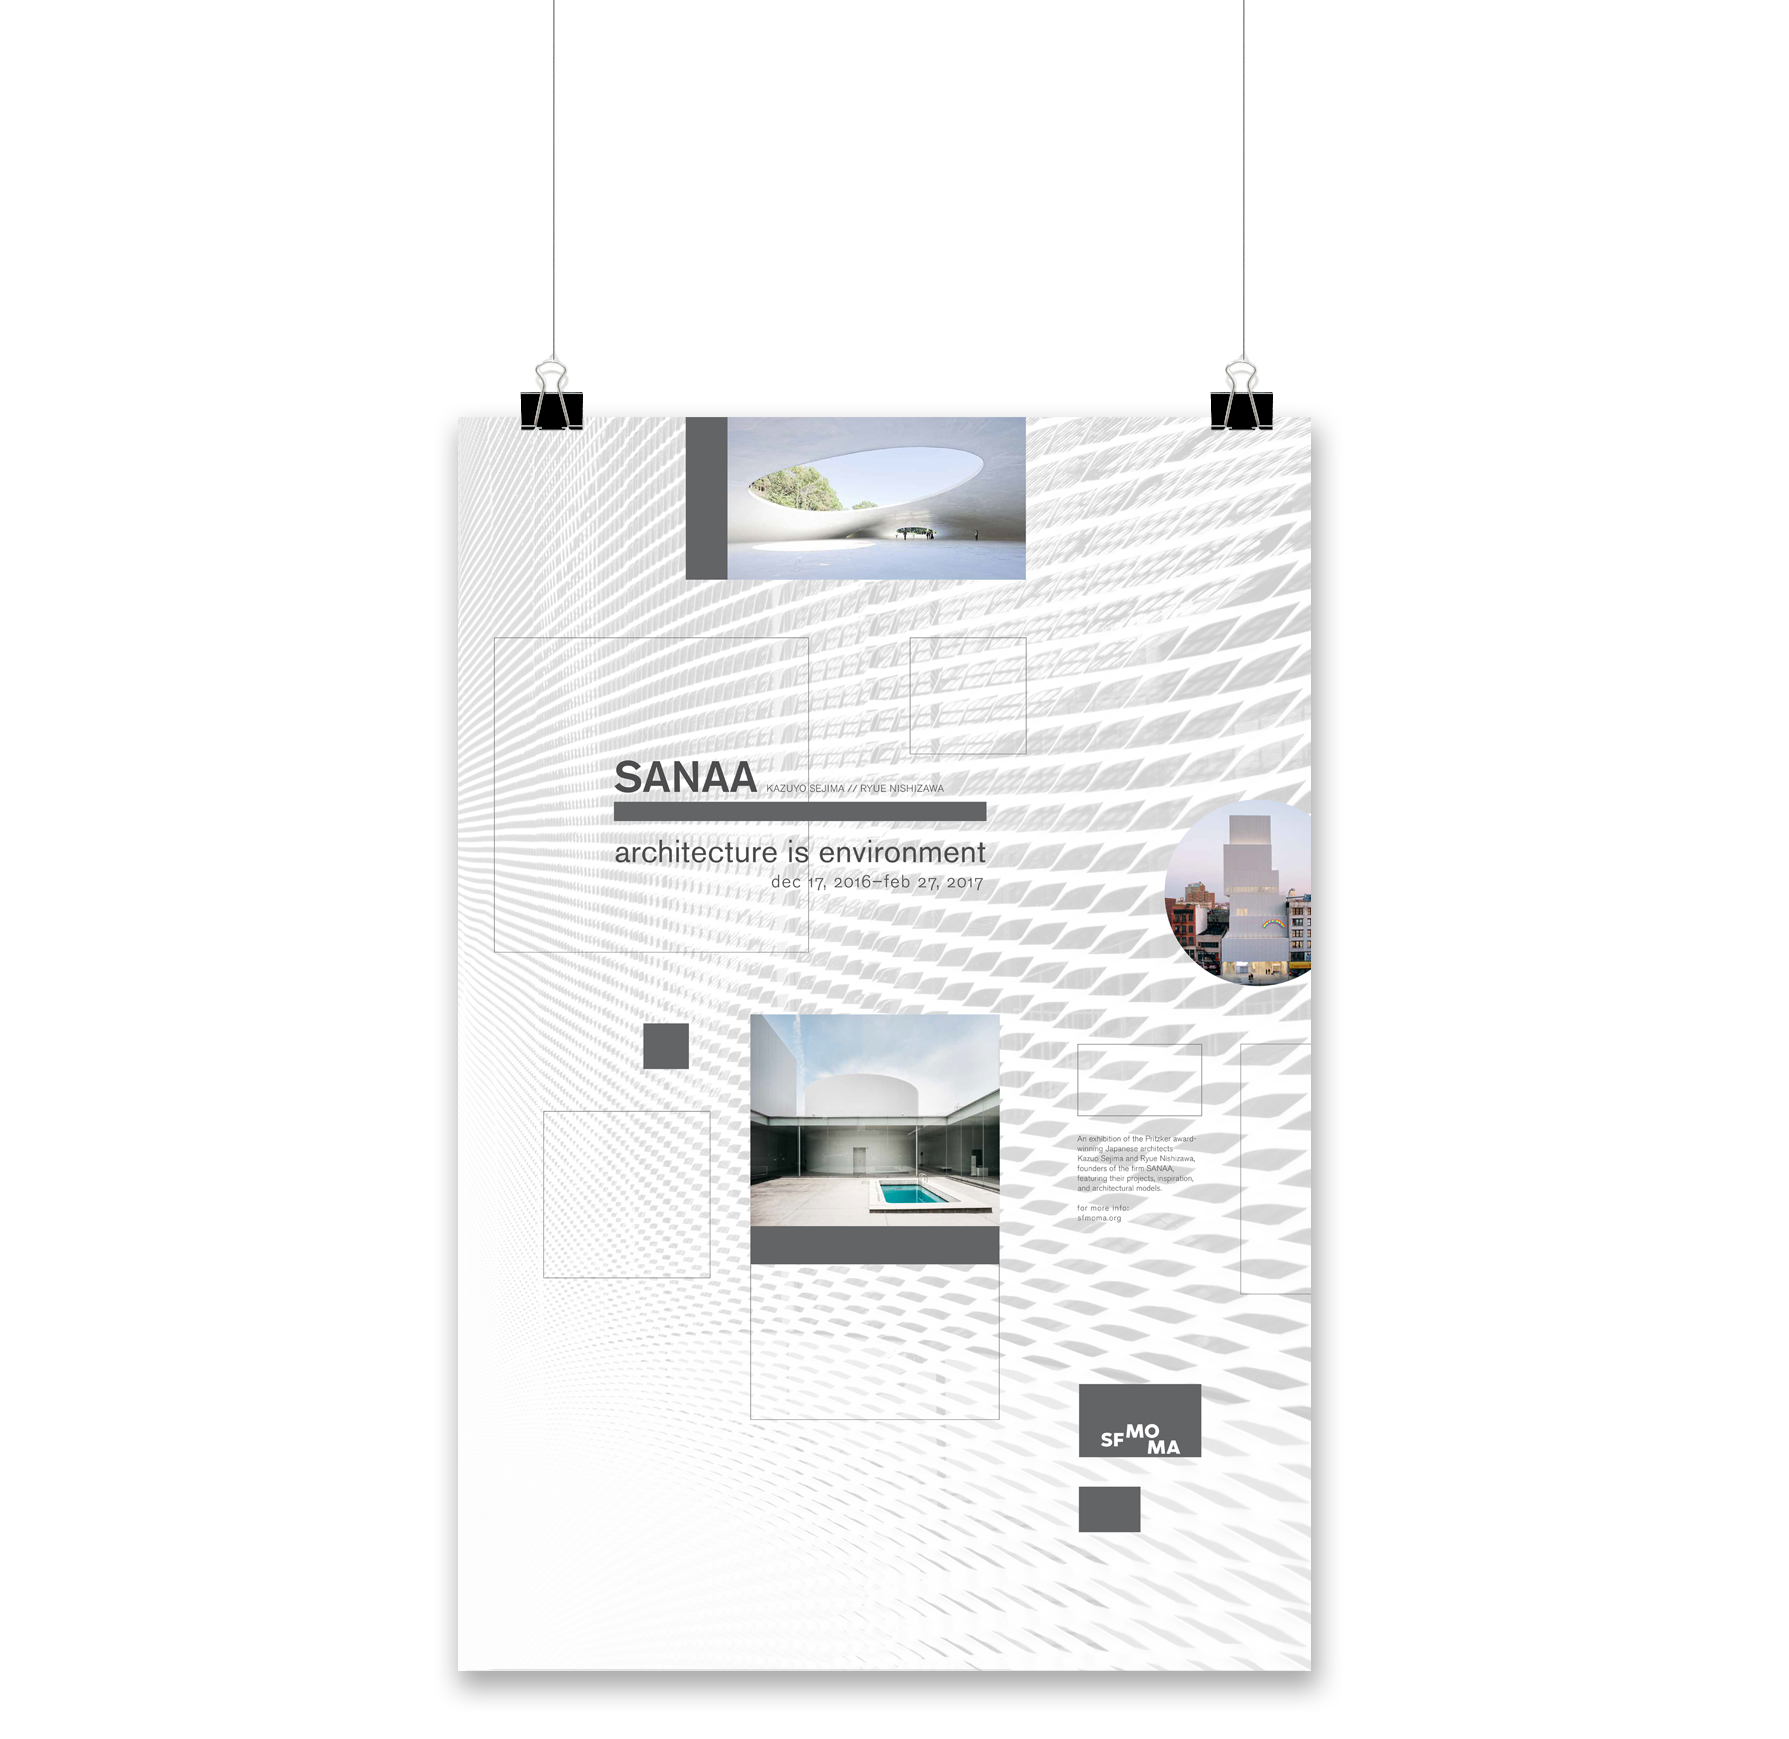 sanaa_poster_hanging.png